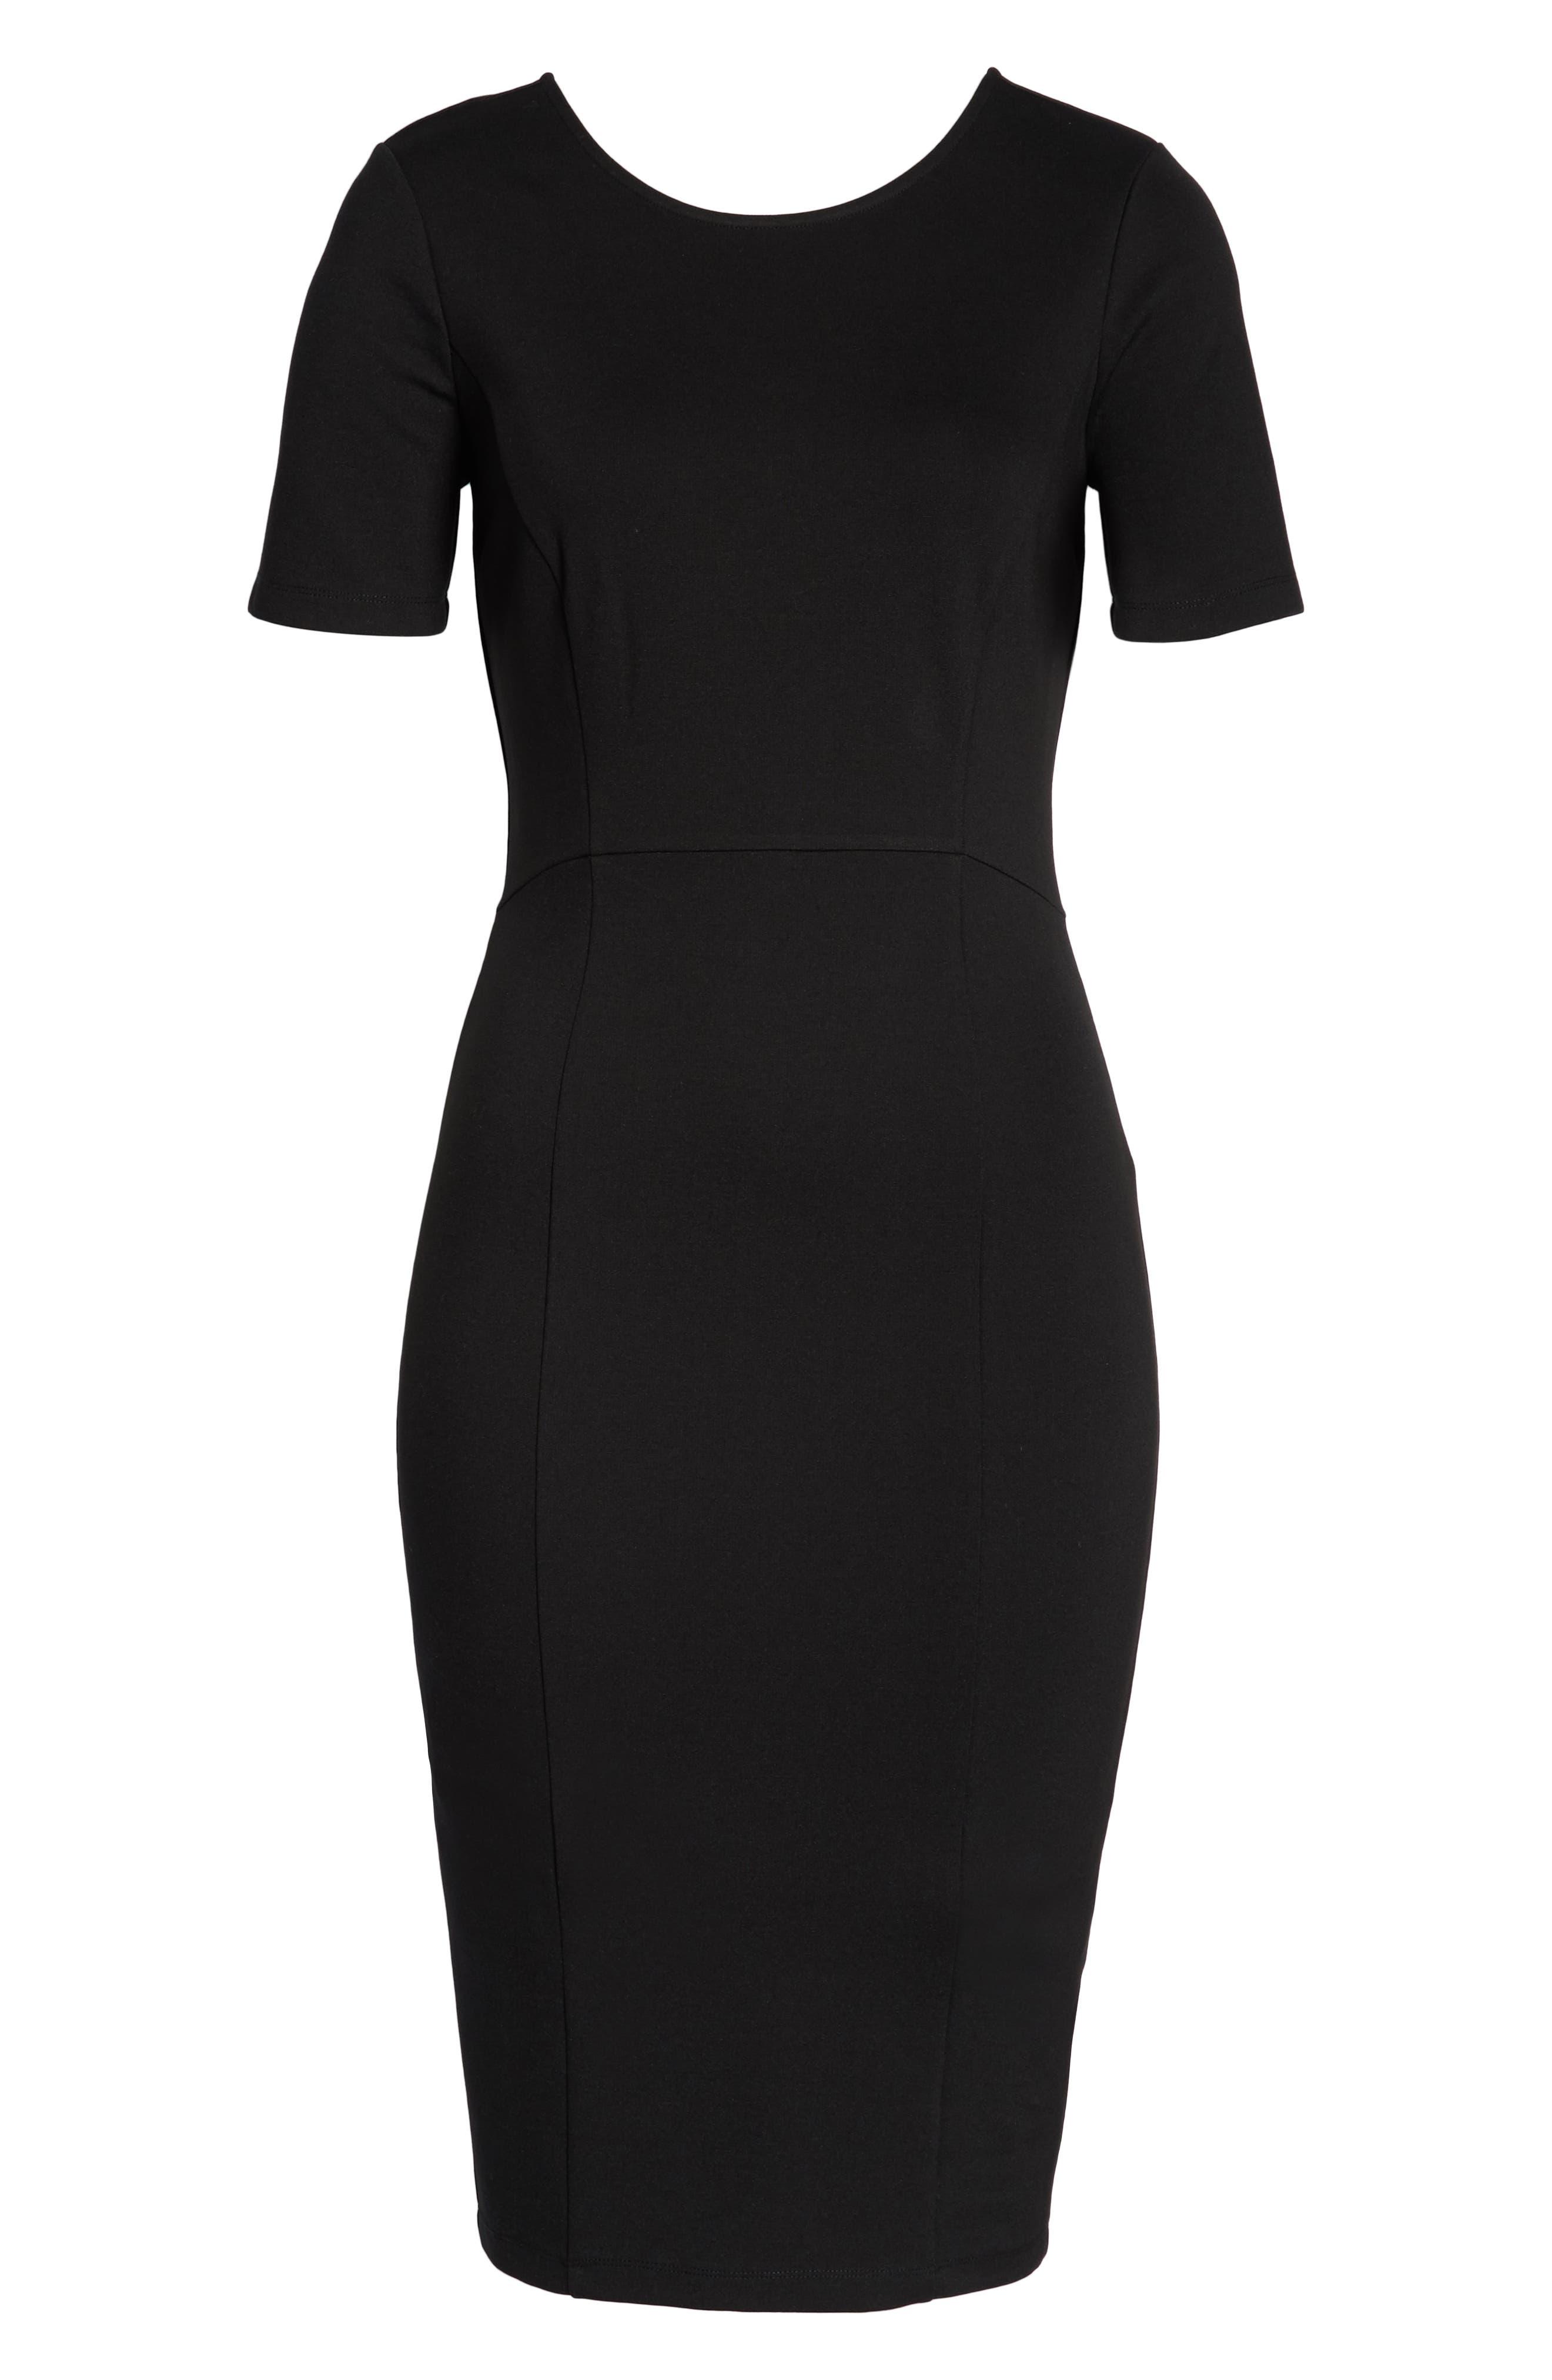 ALI & JAY, Zip Back Sheath Dress, Alternate thumbnail 7, color, BLACK